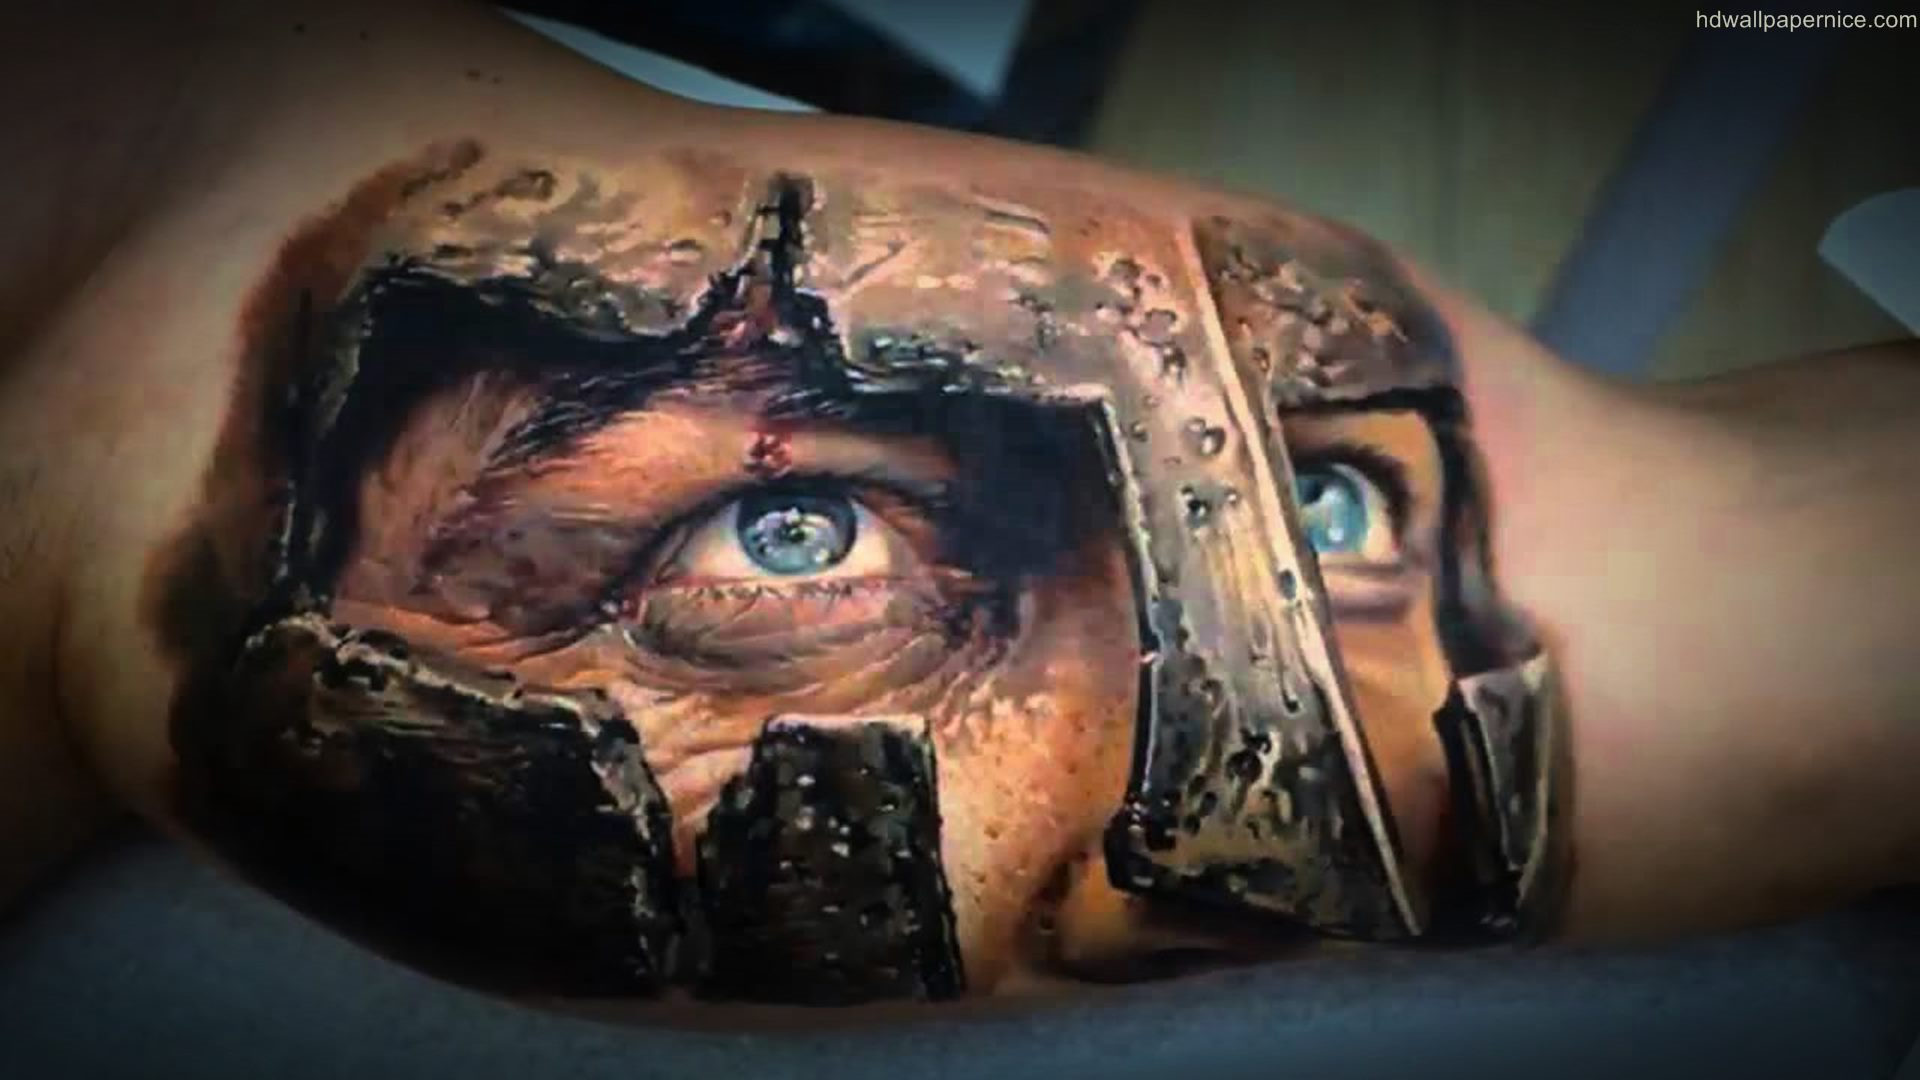 Tattoos Photo Hd Download Hd 1920x1080 Wallpaper Teahub Io